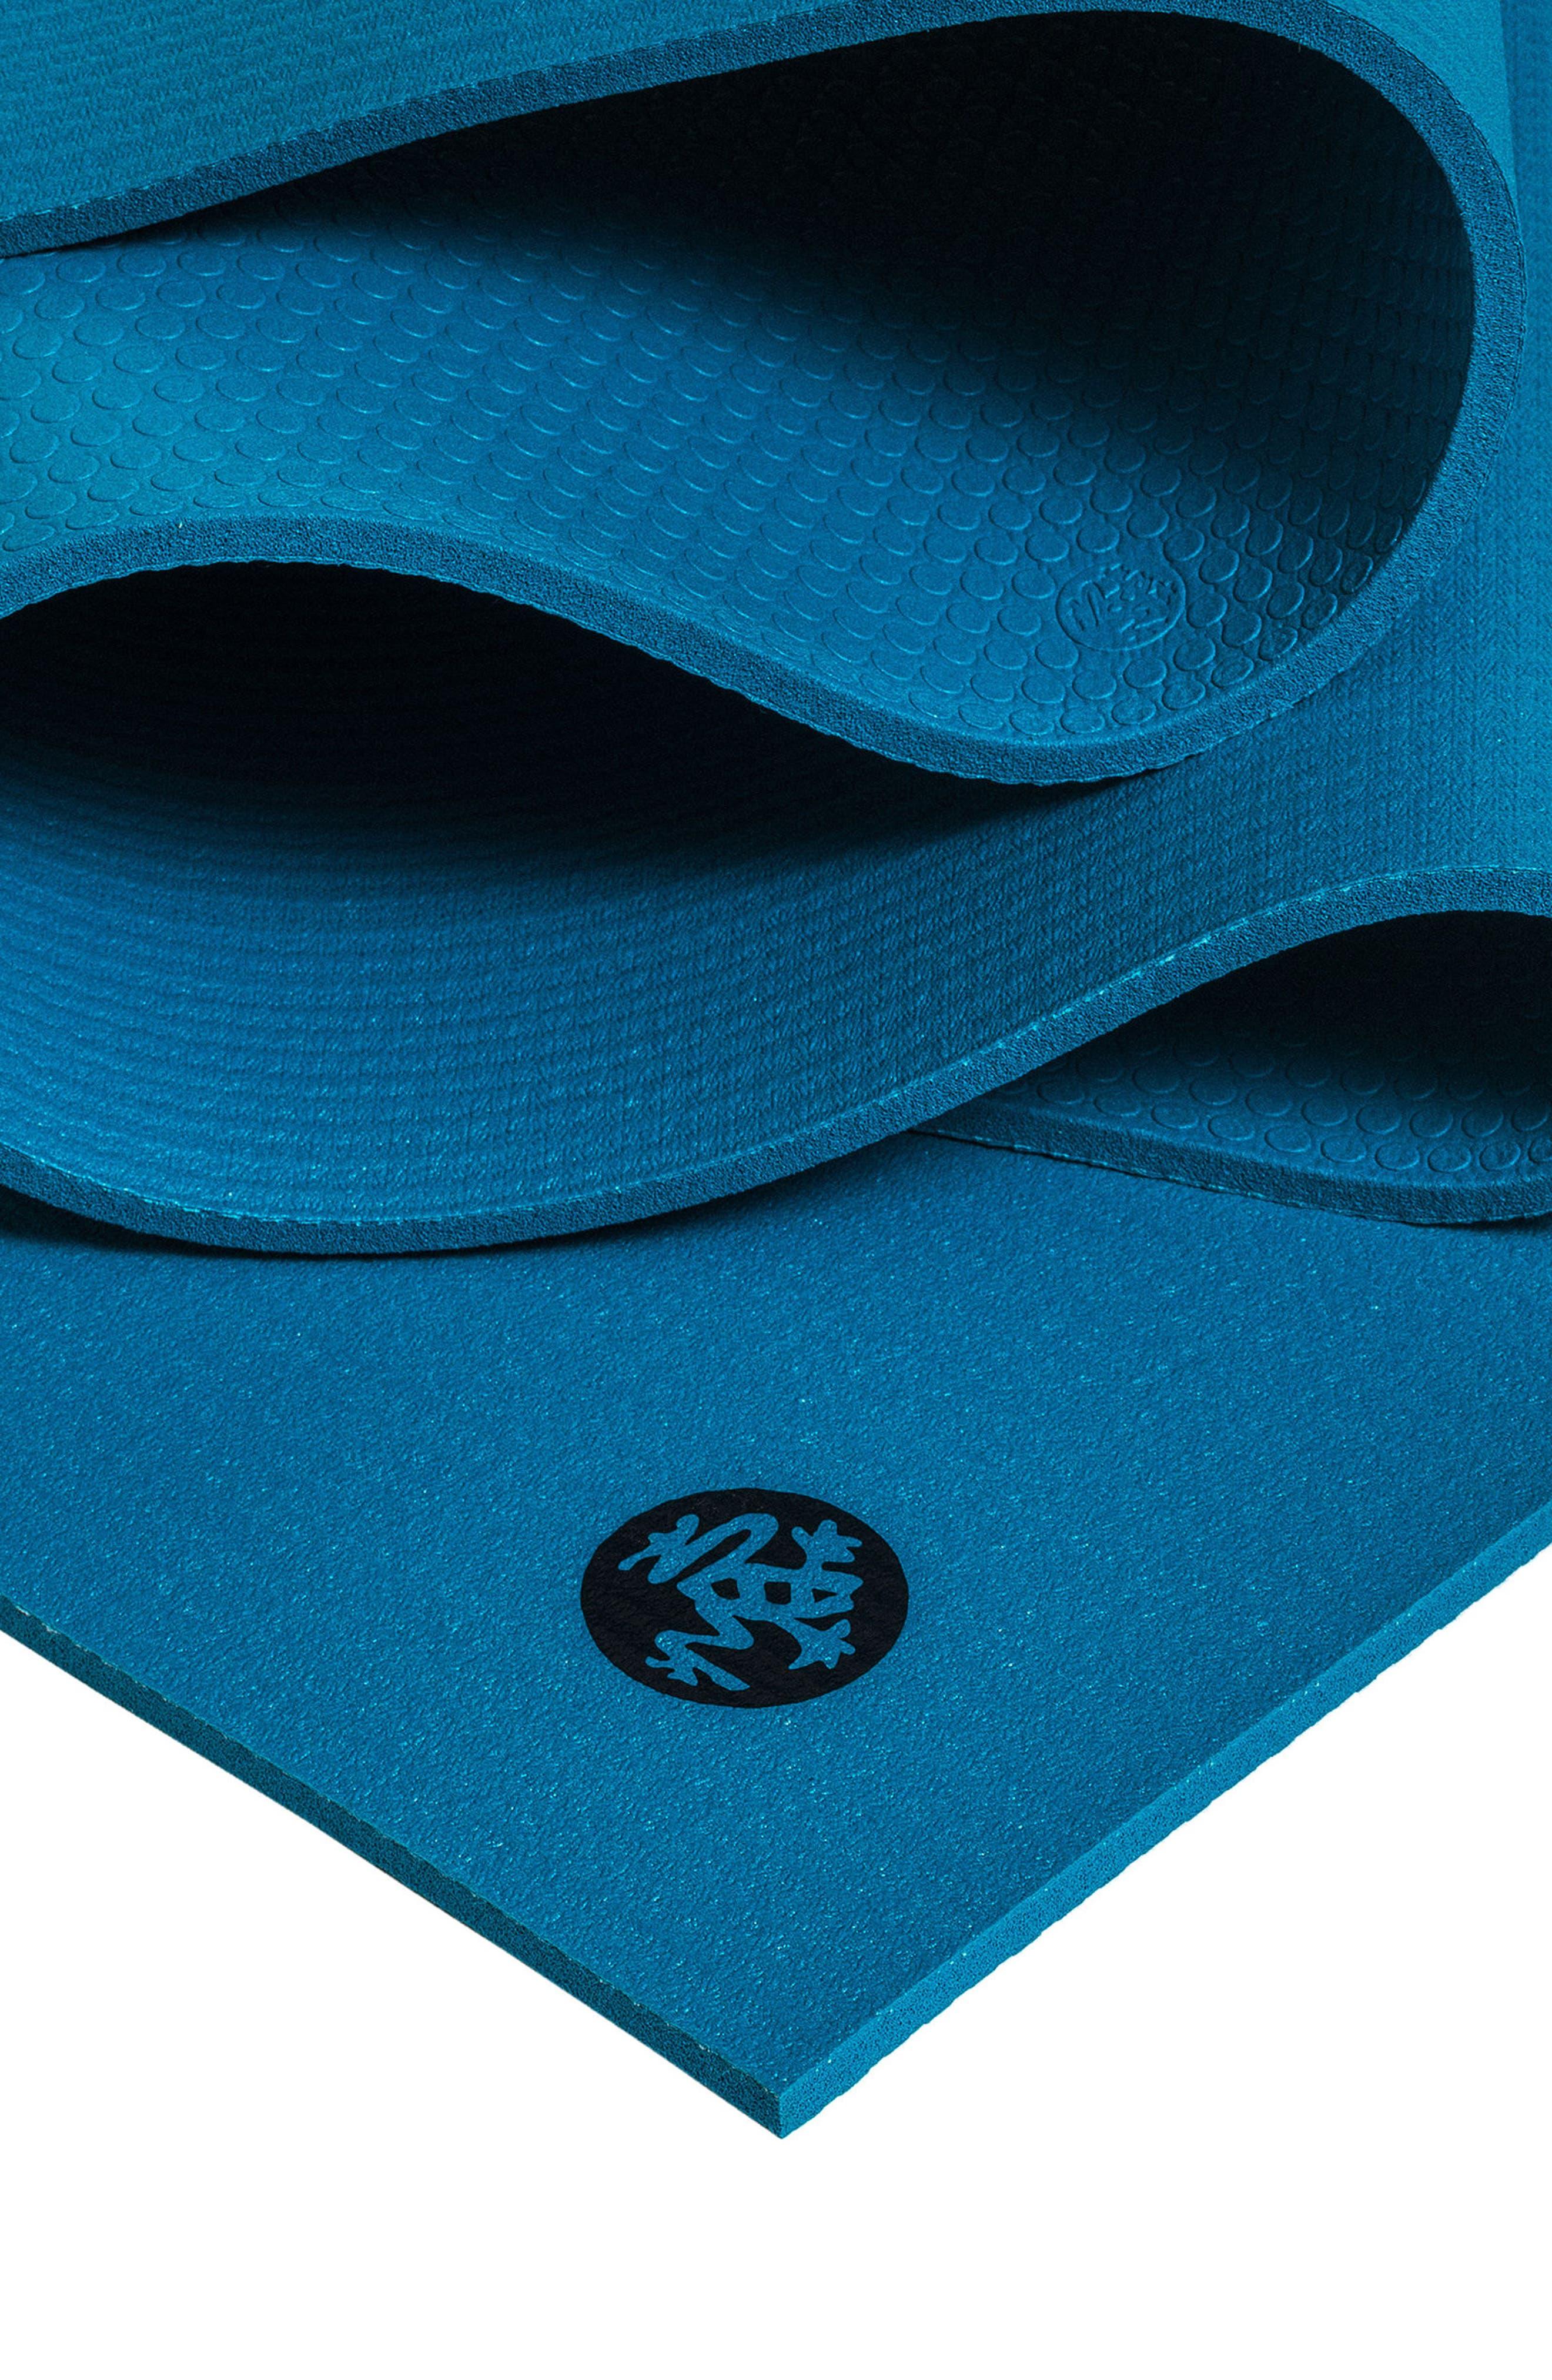 PROlite<sup>®</sup> Yoga Mat,                             Alternate thumbnail 3, color,                             300